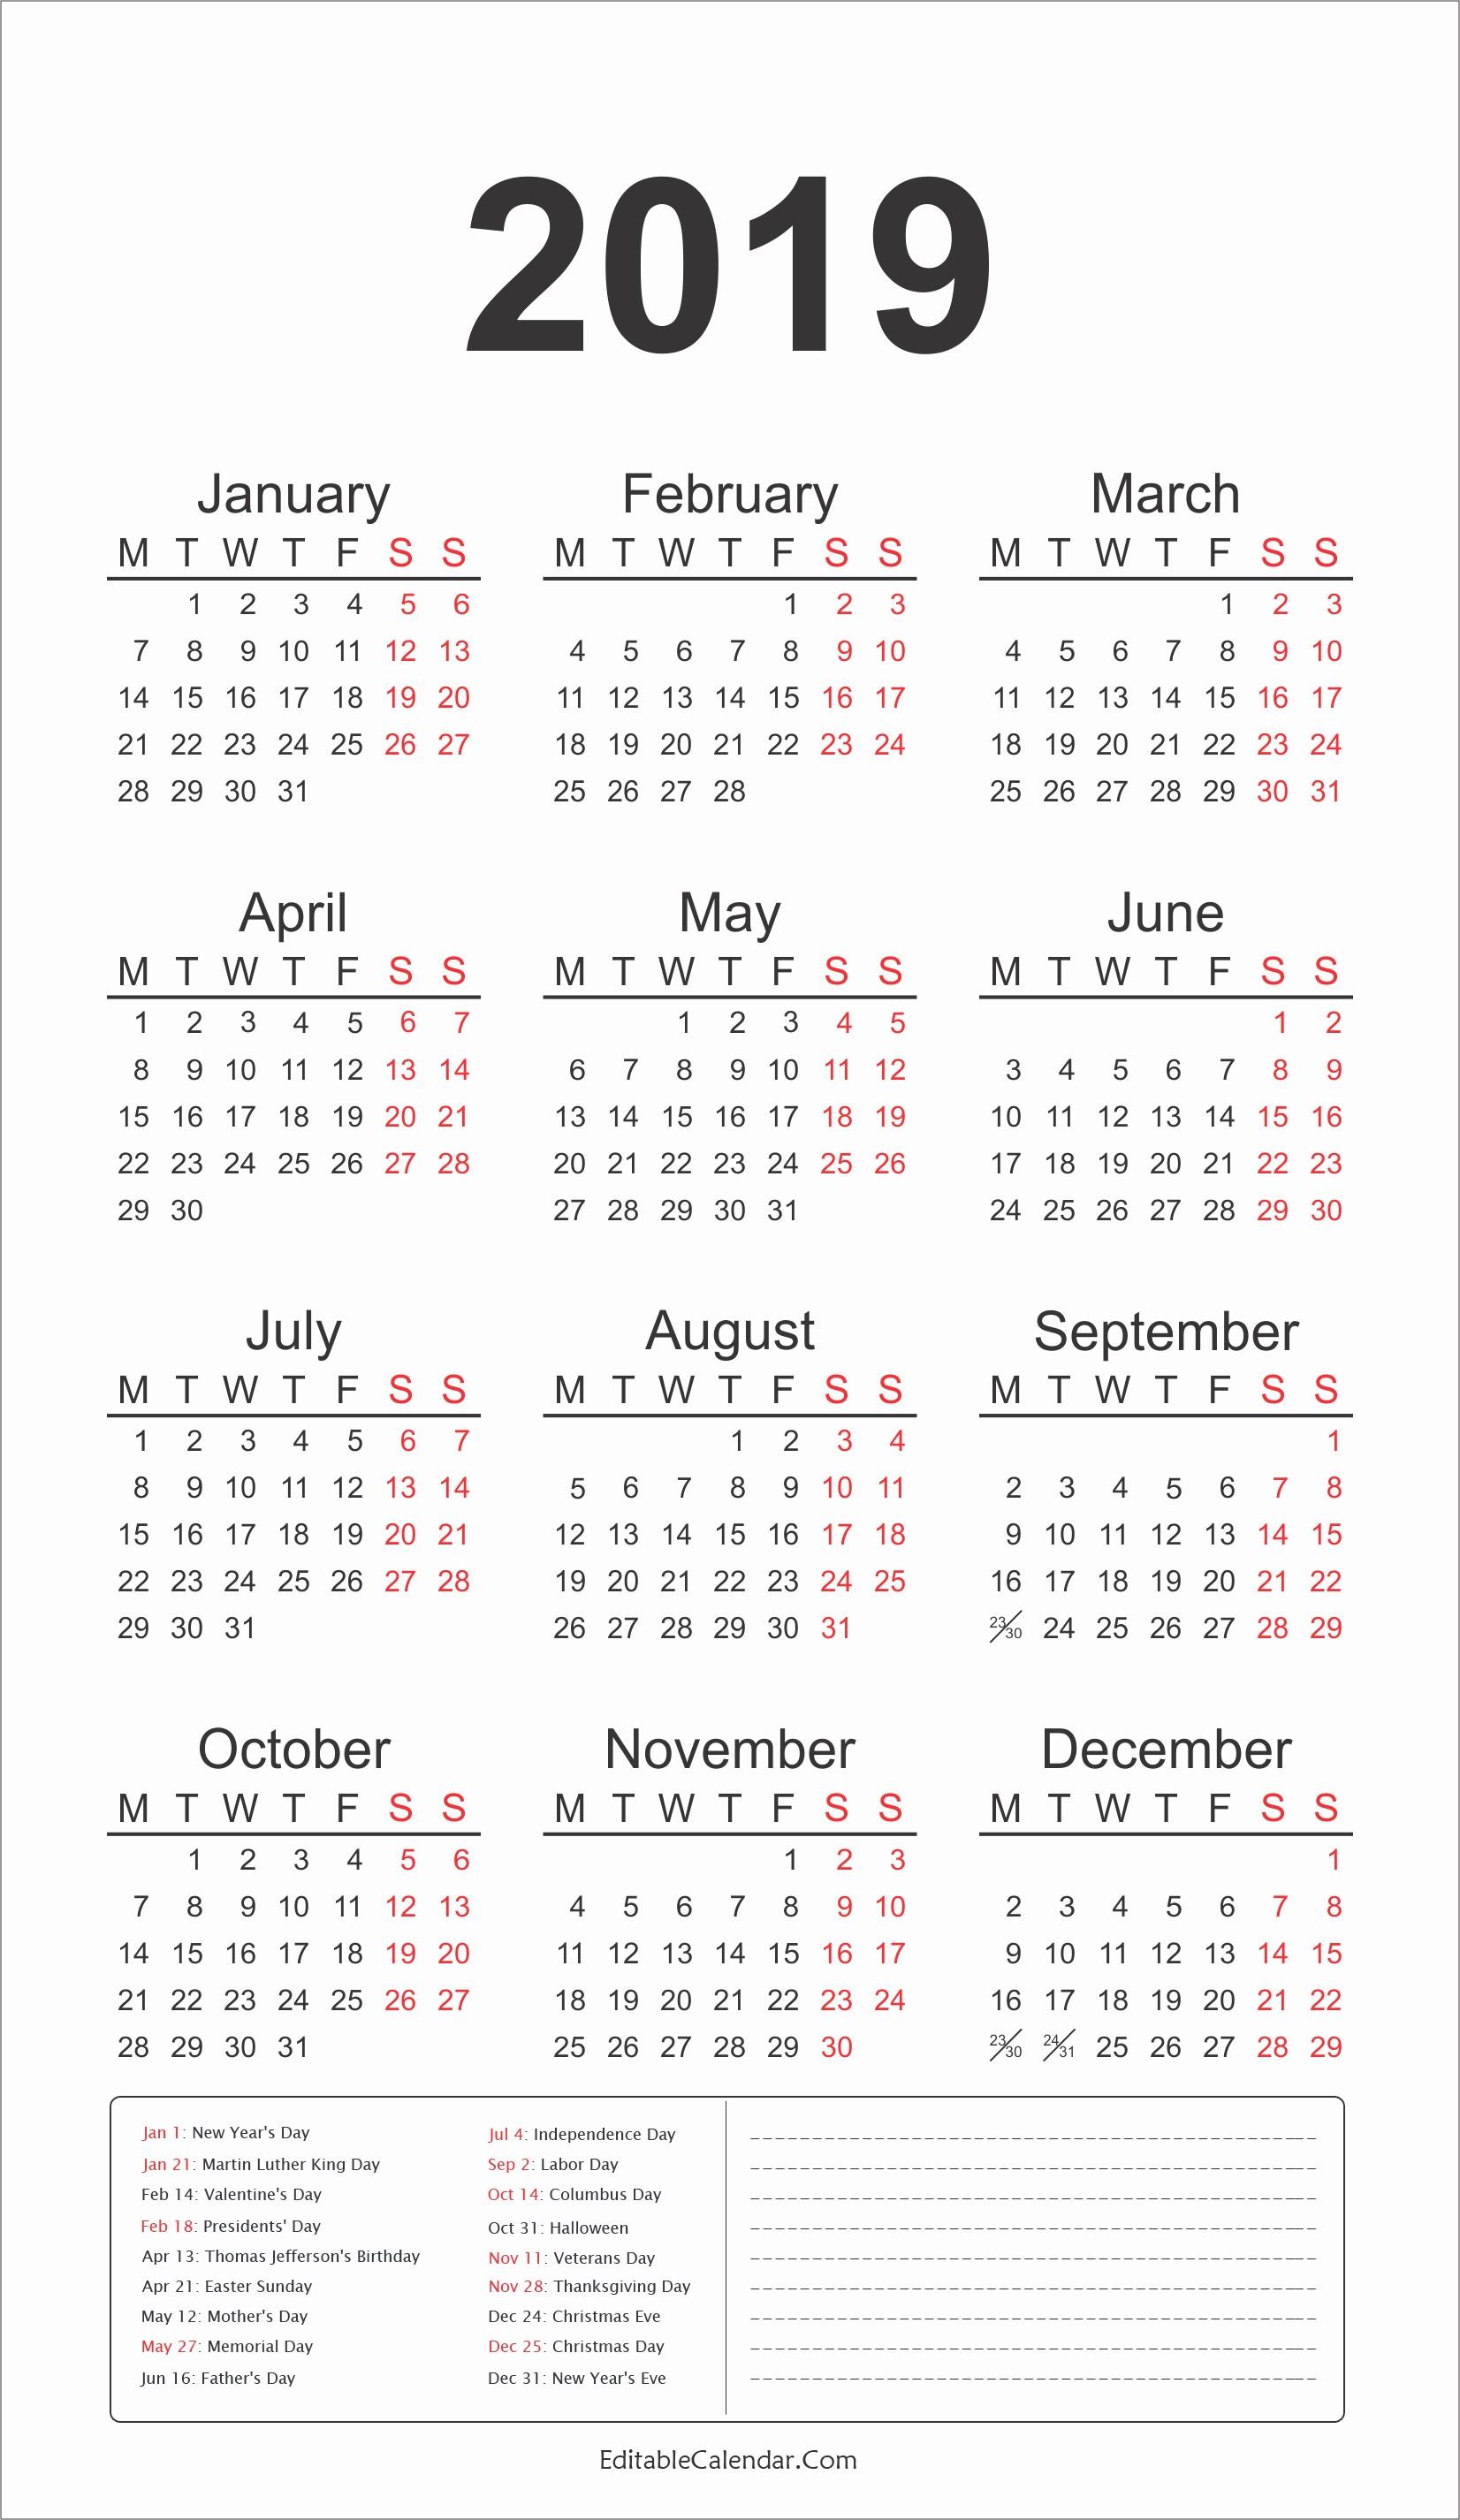 2019 Calendar Excel October 2019 Calendar Download Free Premium Templates 2019 Calendar Template with Us Federal